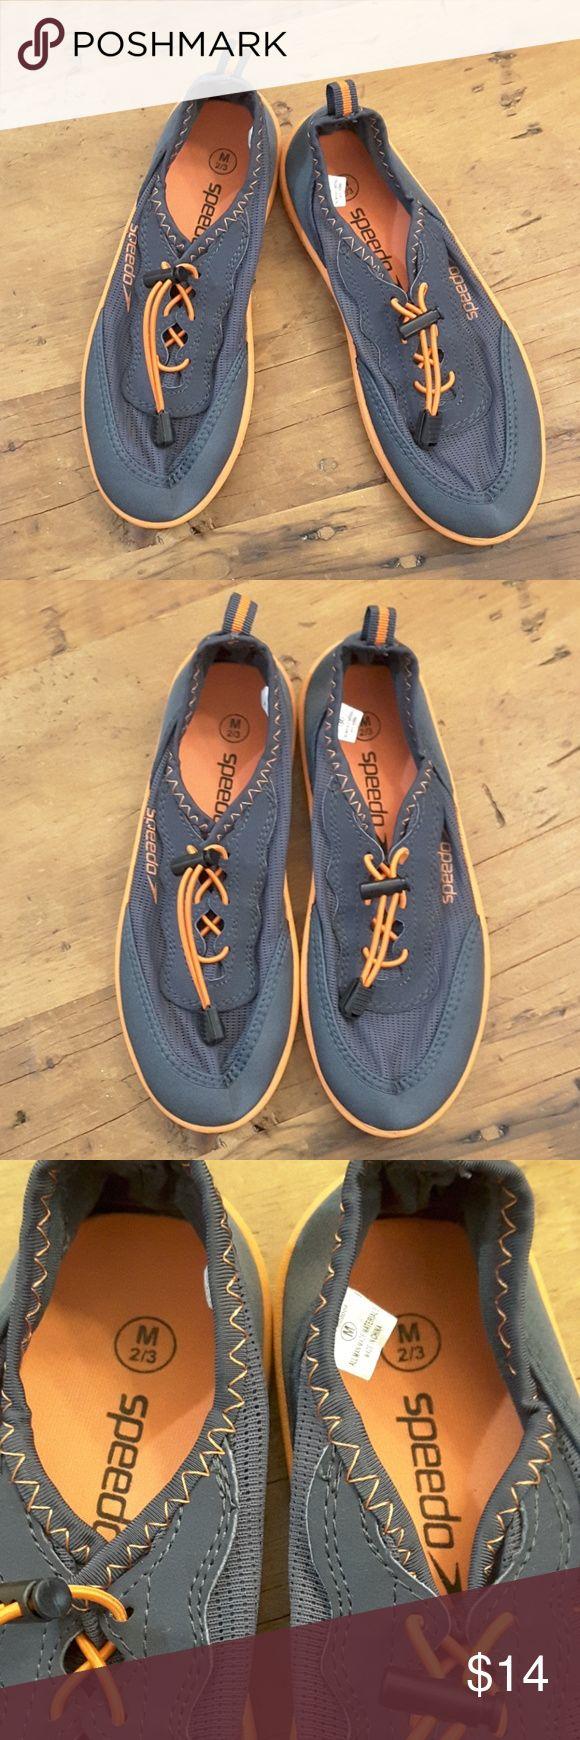 Speedo water shoes Blue and orange Speedo water shoes, size medium 2/3 Speedo Shoes Water Shoes